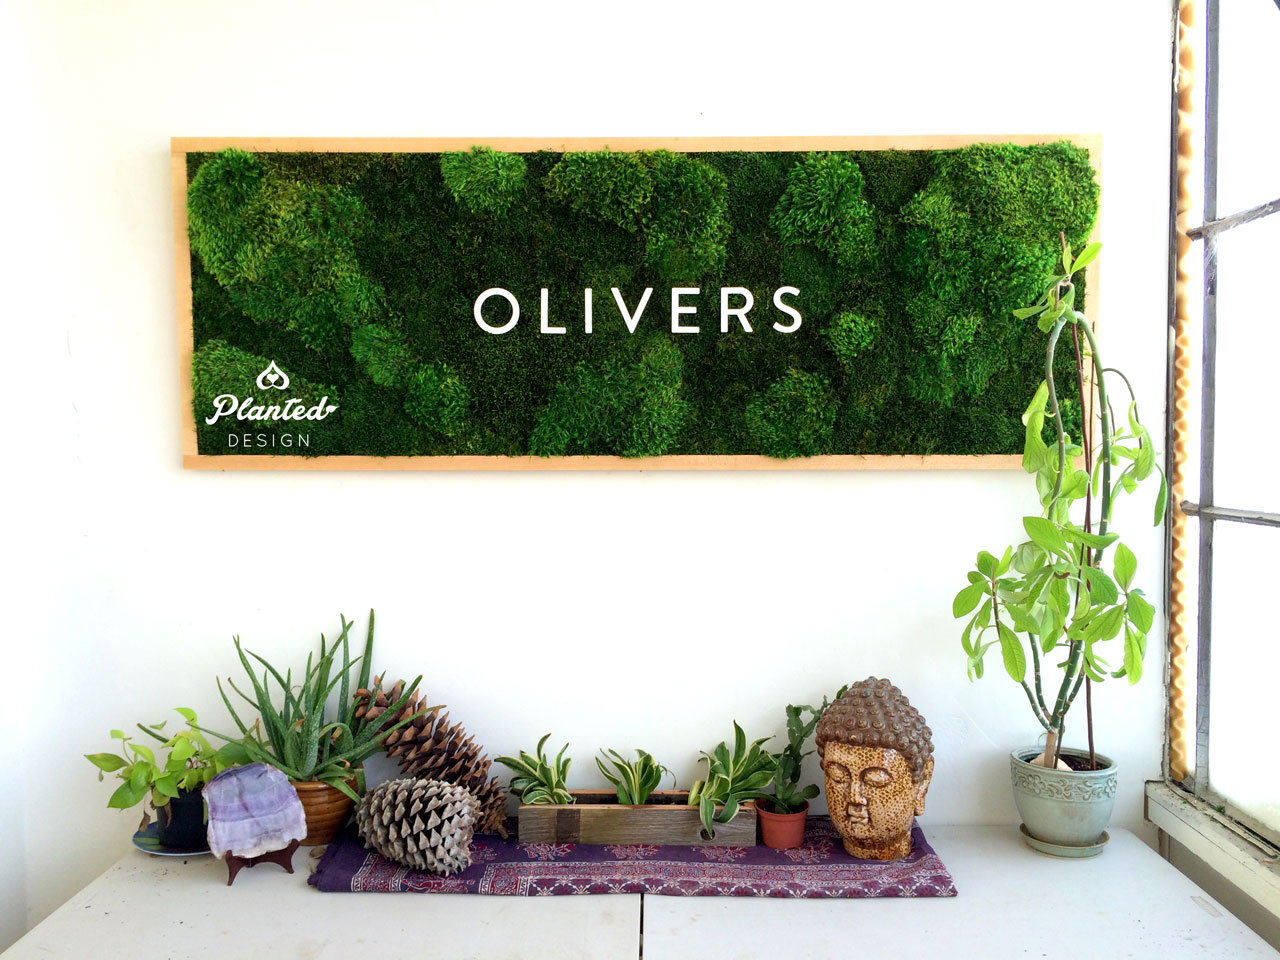 PlantedDesign-Moss-Wall-SF-Olivers-2.jpg